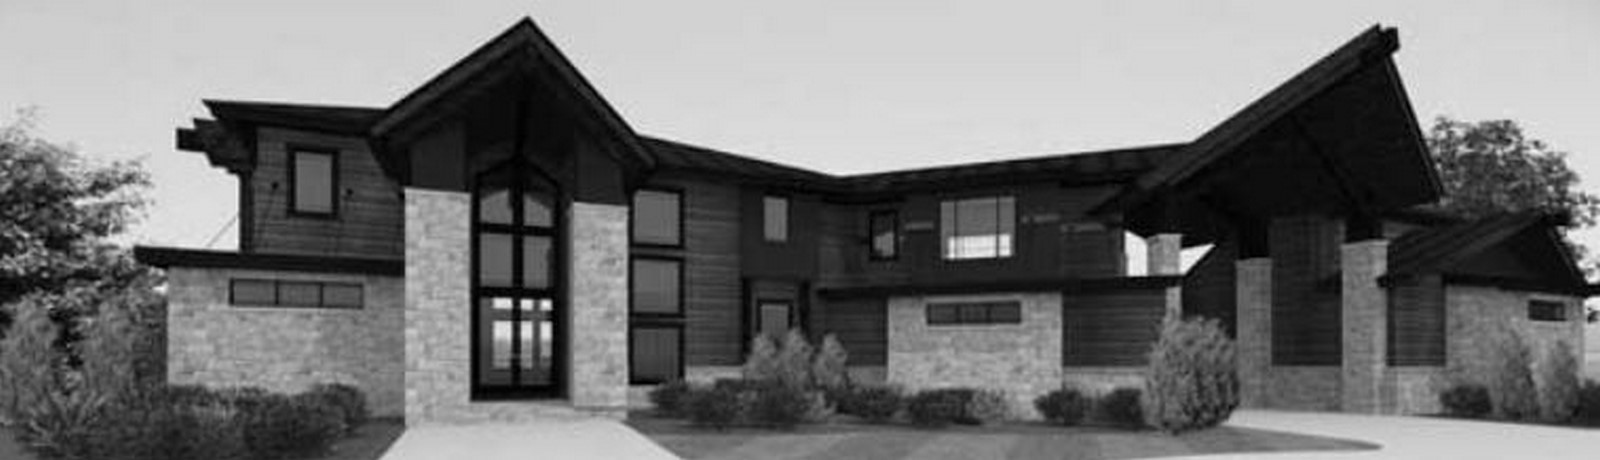 Architects in Omaha - Top 45 Architects in Omaha - Sheet44